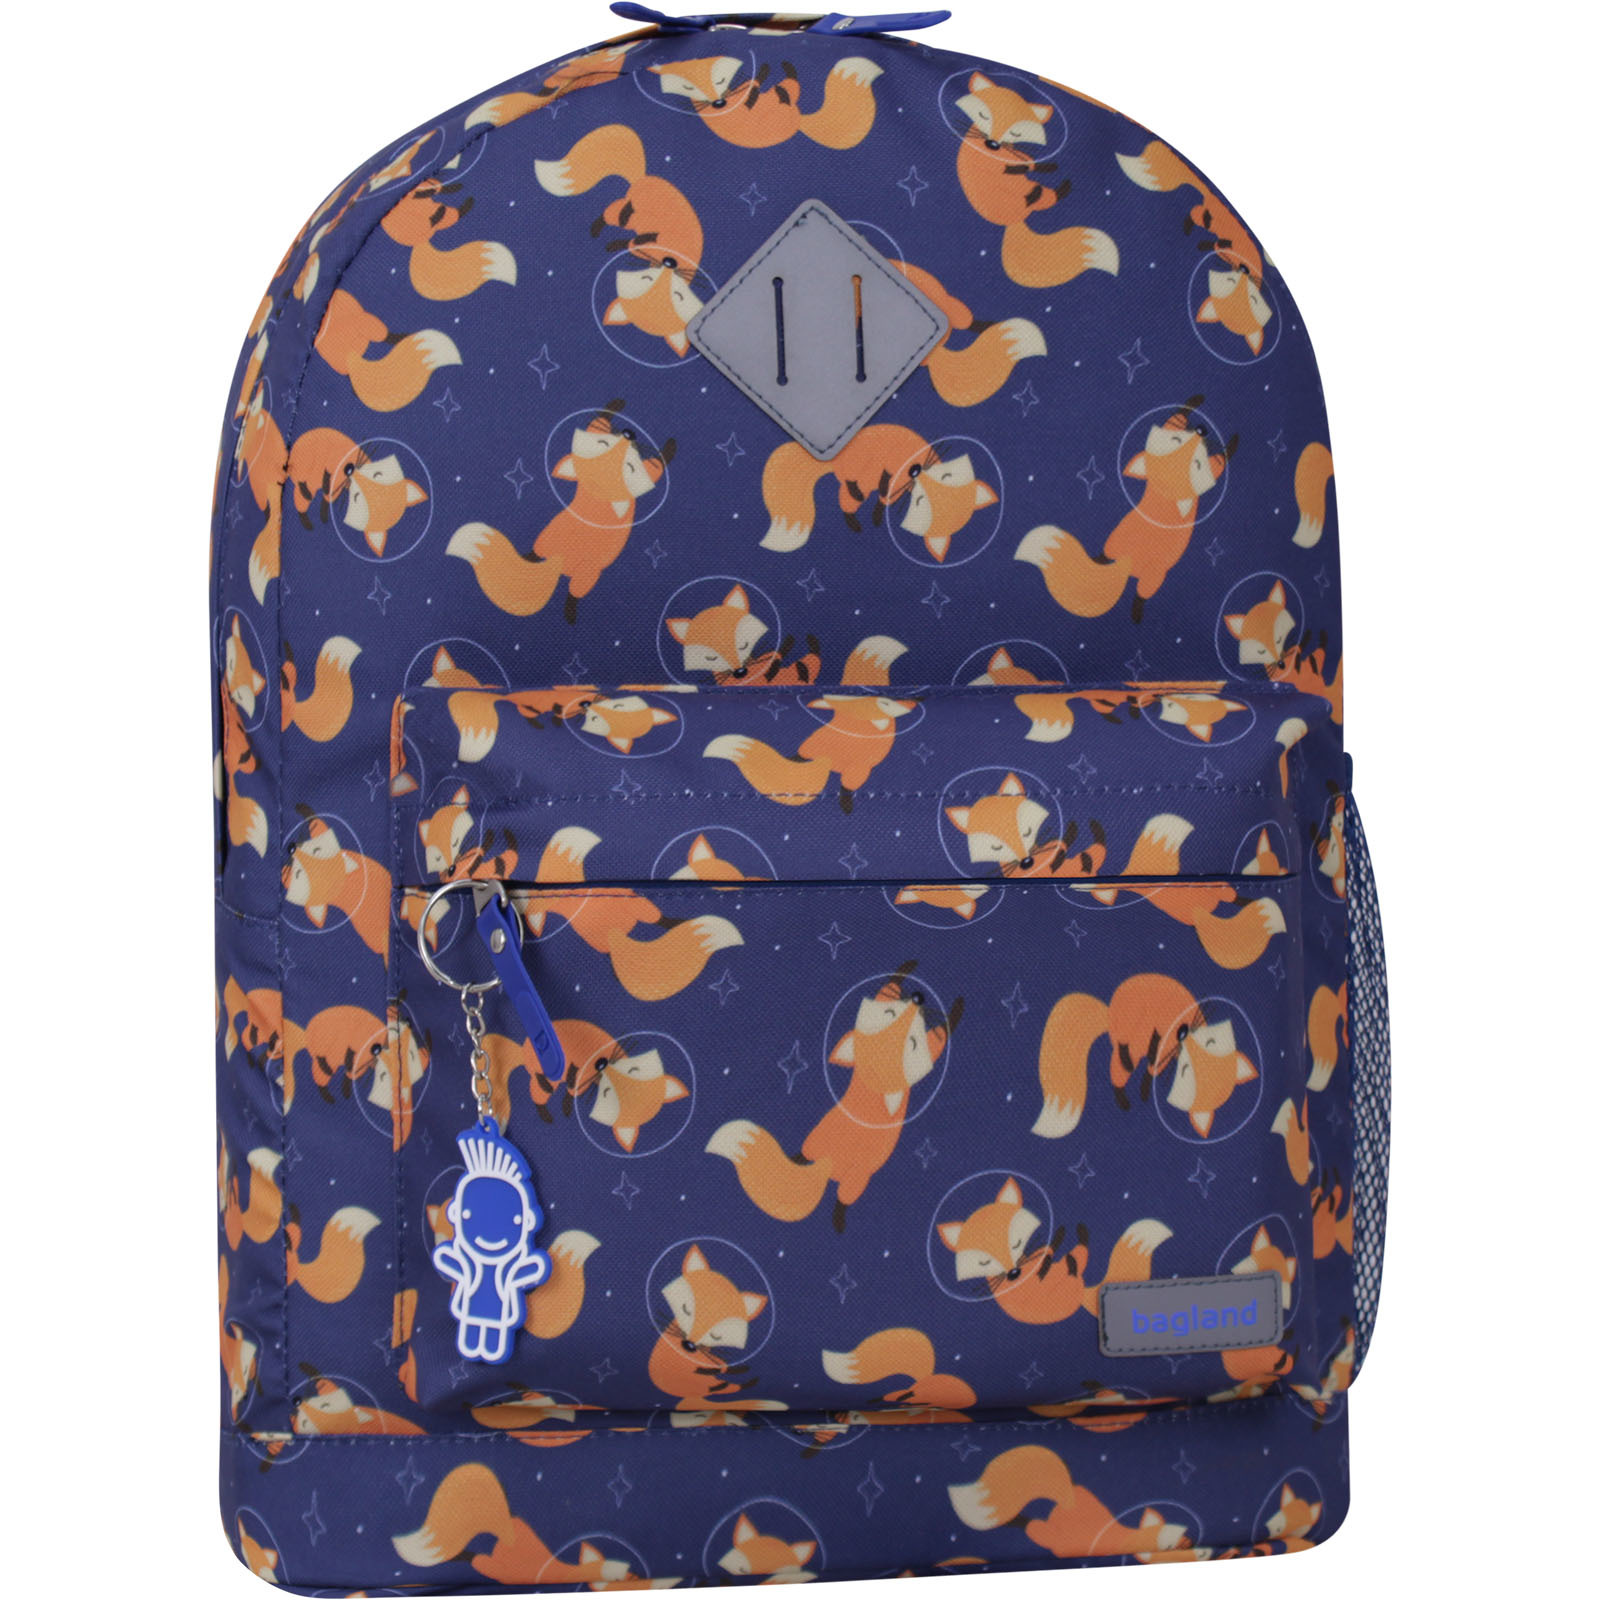 Городские рюкзаки Рюкзак Bagland Молодежный 17 л. сублимация 980 (00533664) IMG_0330_суб.980_-1600.jpg